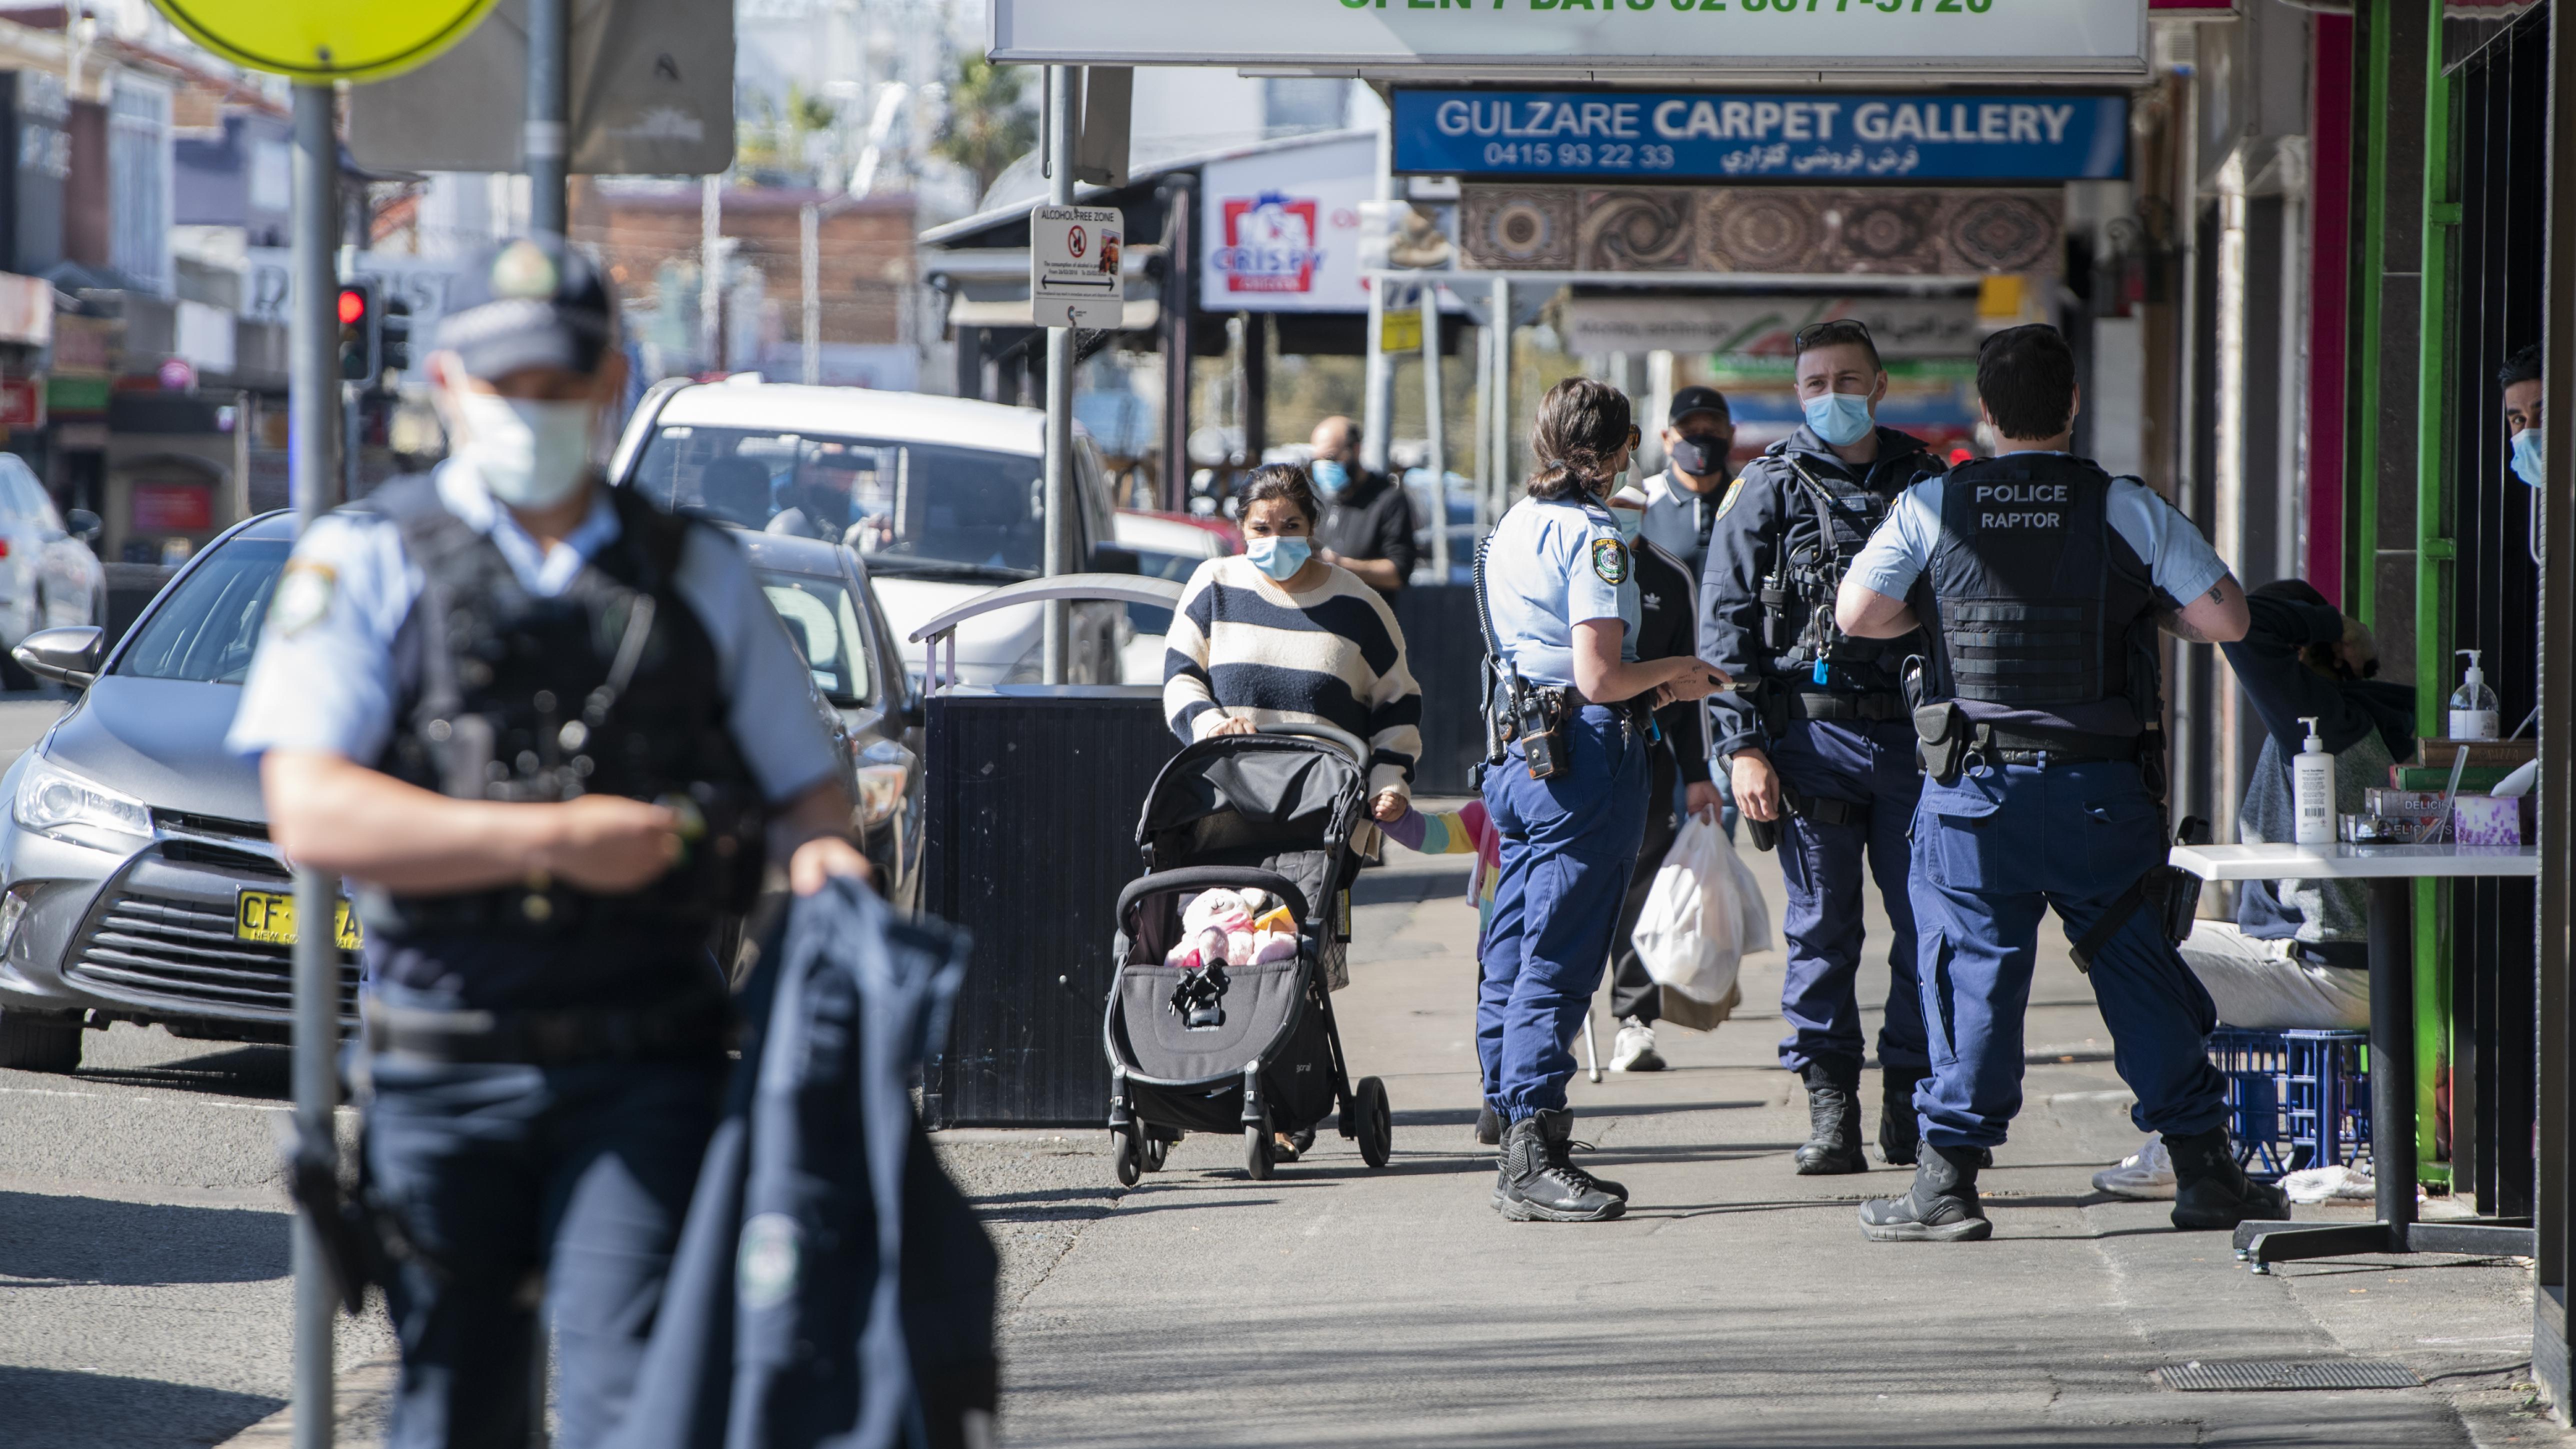 Police on Merrylands Road, Merrylands, Sydney.